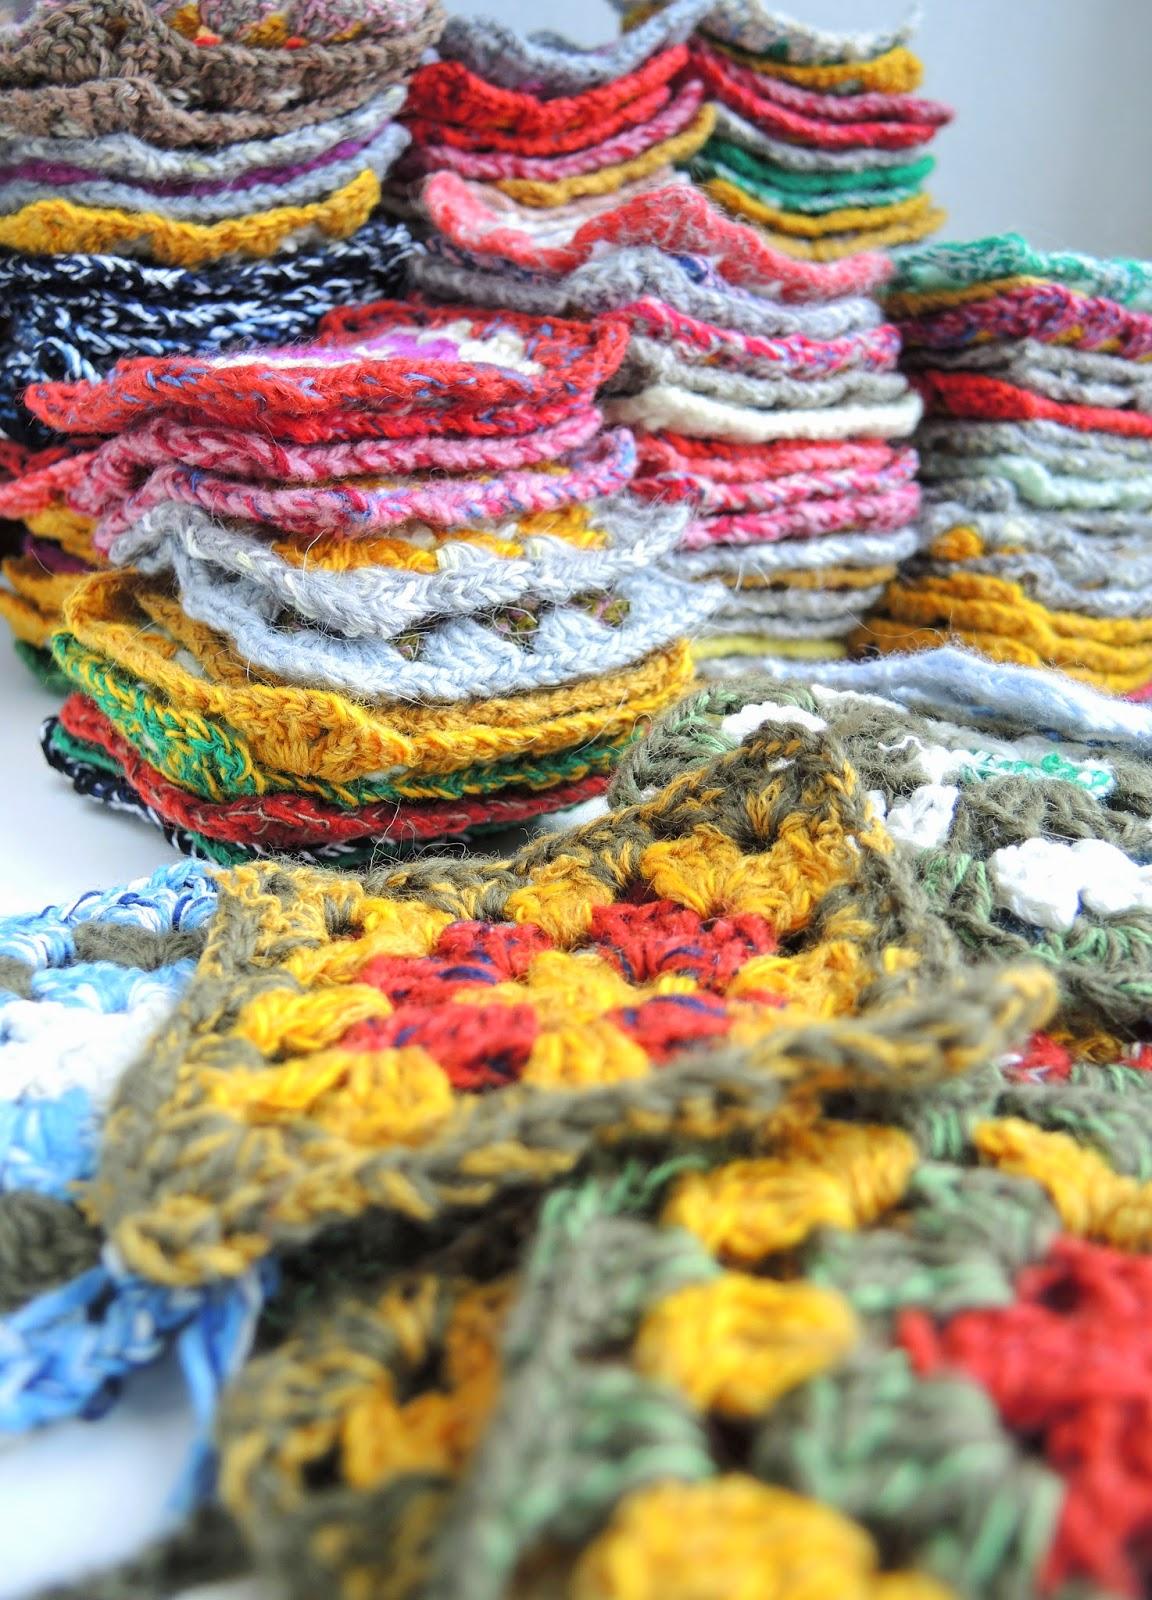 plaid.jpg, blanket.jpg. blanket, bedspread, blanket, crochet, plaid schemes, baby blankets,  плед, плед крючком, плед схемы, детские пледы, детский плед, плед крючком схемы, вязание пледа, пледы для новорожденных, плед для новорожденного, вязаный плед, связать плед, вязанный плед, вязание крючком пледы, покрывала и пледы, плед из квадратов, детский плед крючком, детские пледы крючком, плед описание, плед фото, схемы вязания пледов, плед своими руками, плед для новорожденного схемы, плед для новорожденных схемы, плед детский схема, схемы детских пледов, пледы крючком для новорожденных, плед для новорожденного крючком, плед на выписку, под пледом, плед из квадратов крючком,  вязание крючком пледы схемы, плед для начинающих, плед на диван, плед крючком описание, крючком для новорожденных схемы, вяжем для новорожденных, вязание новорожденным, на выписку крючком, квадраты крючком, покрывало крючком,